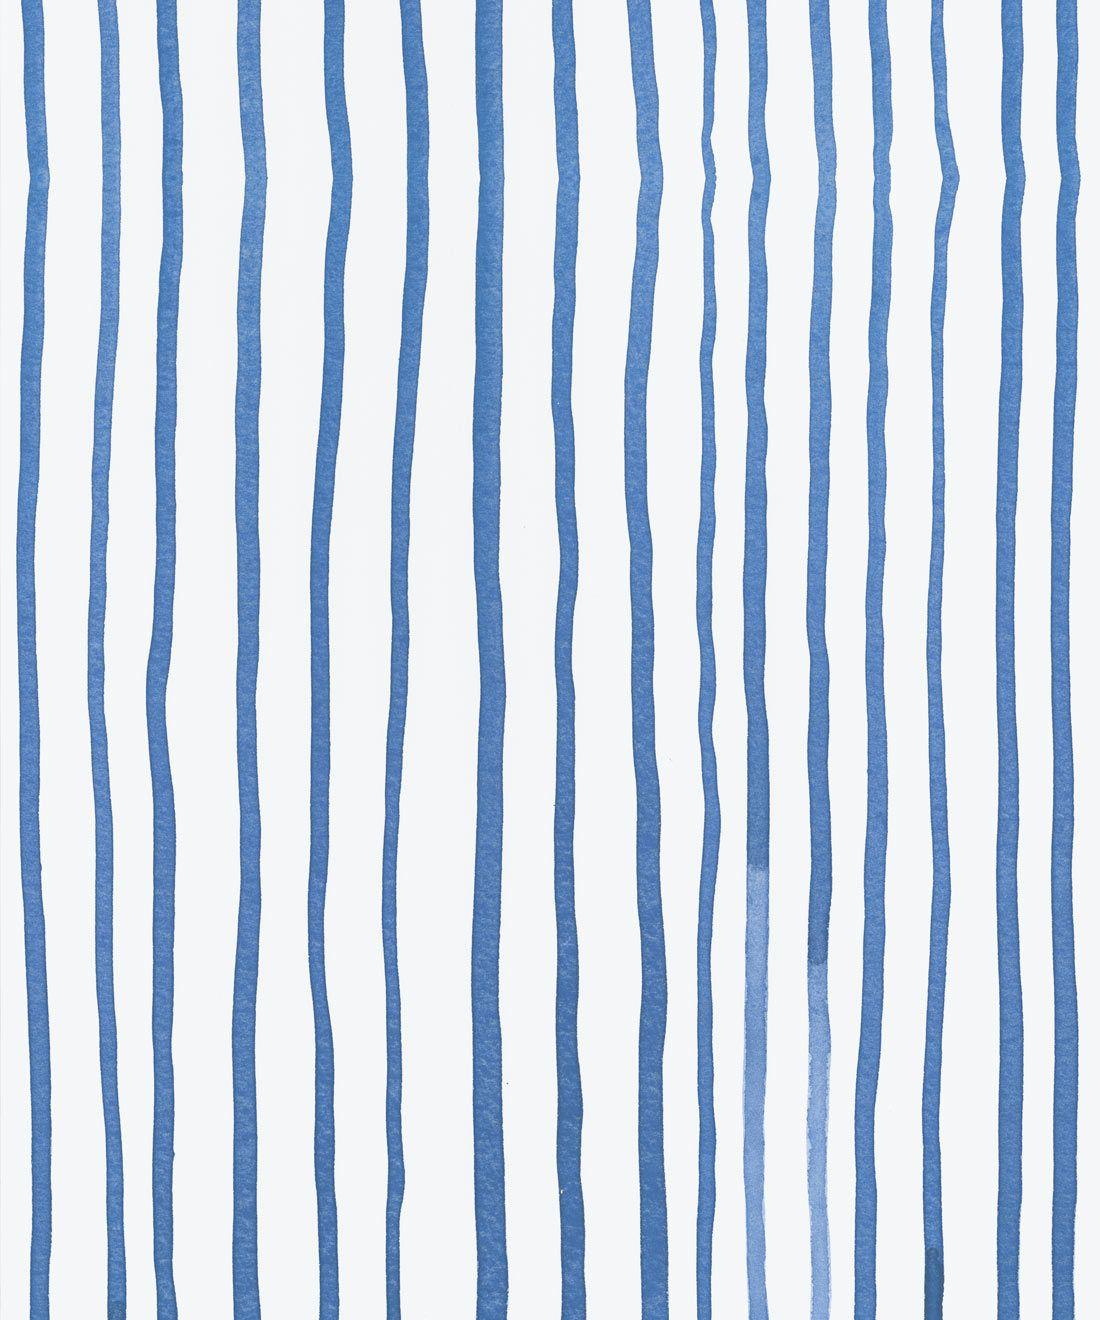 Zighy Stripes •Striped Wallpaper •Blue Stripes • Milton & King USA • Georgia MacMillan